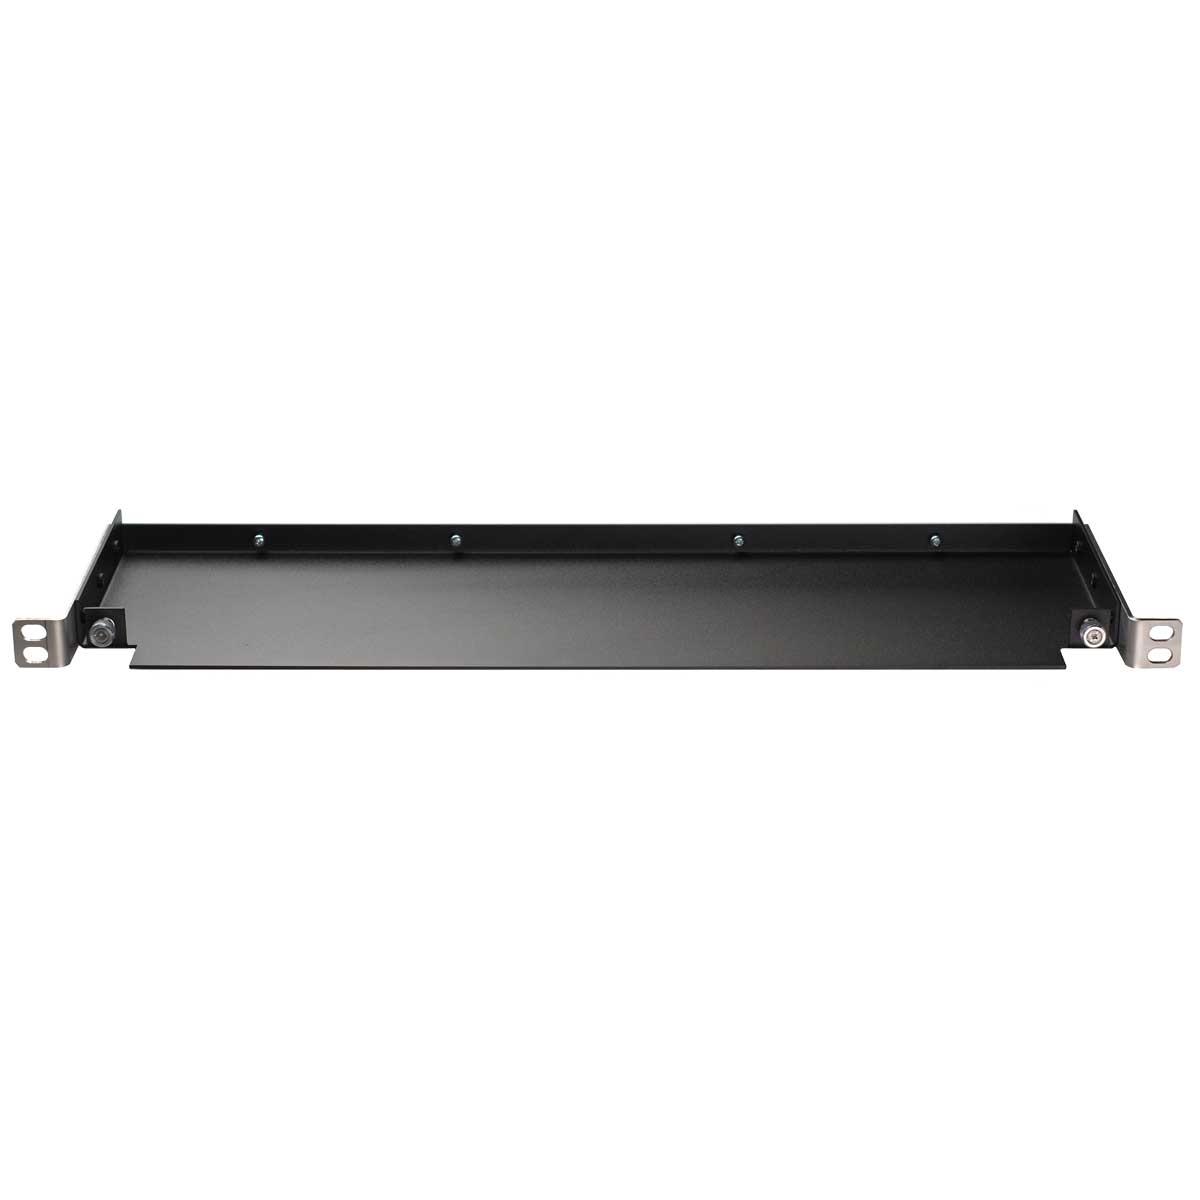 "RFR 1018 yellobrik 19"" Rack Tray"